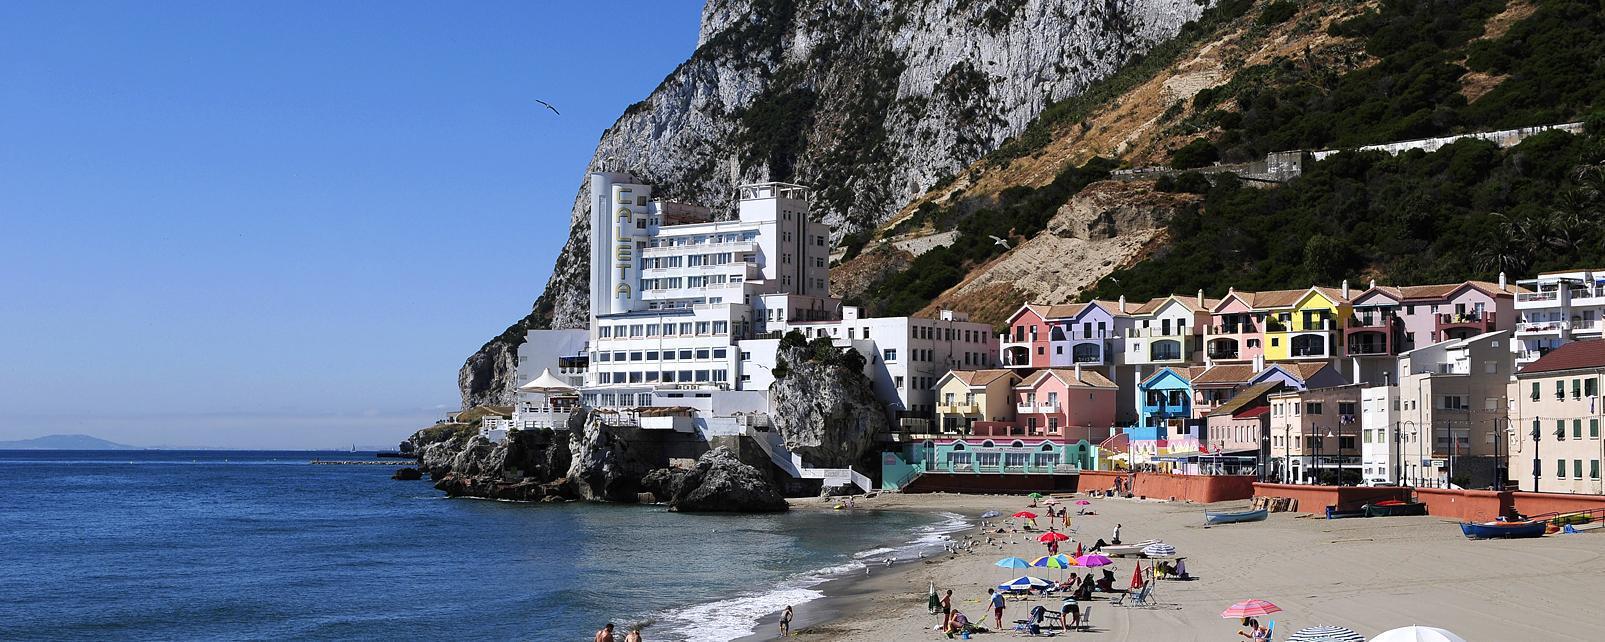 Europe; Espagne; Royaume-Uni; Gibraltar; plage; baignade; parasol; ville; montagne; maison; mer;